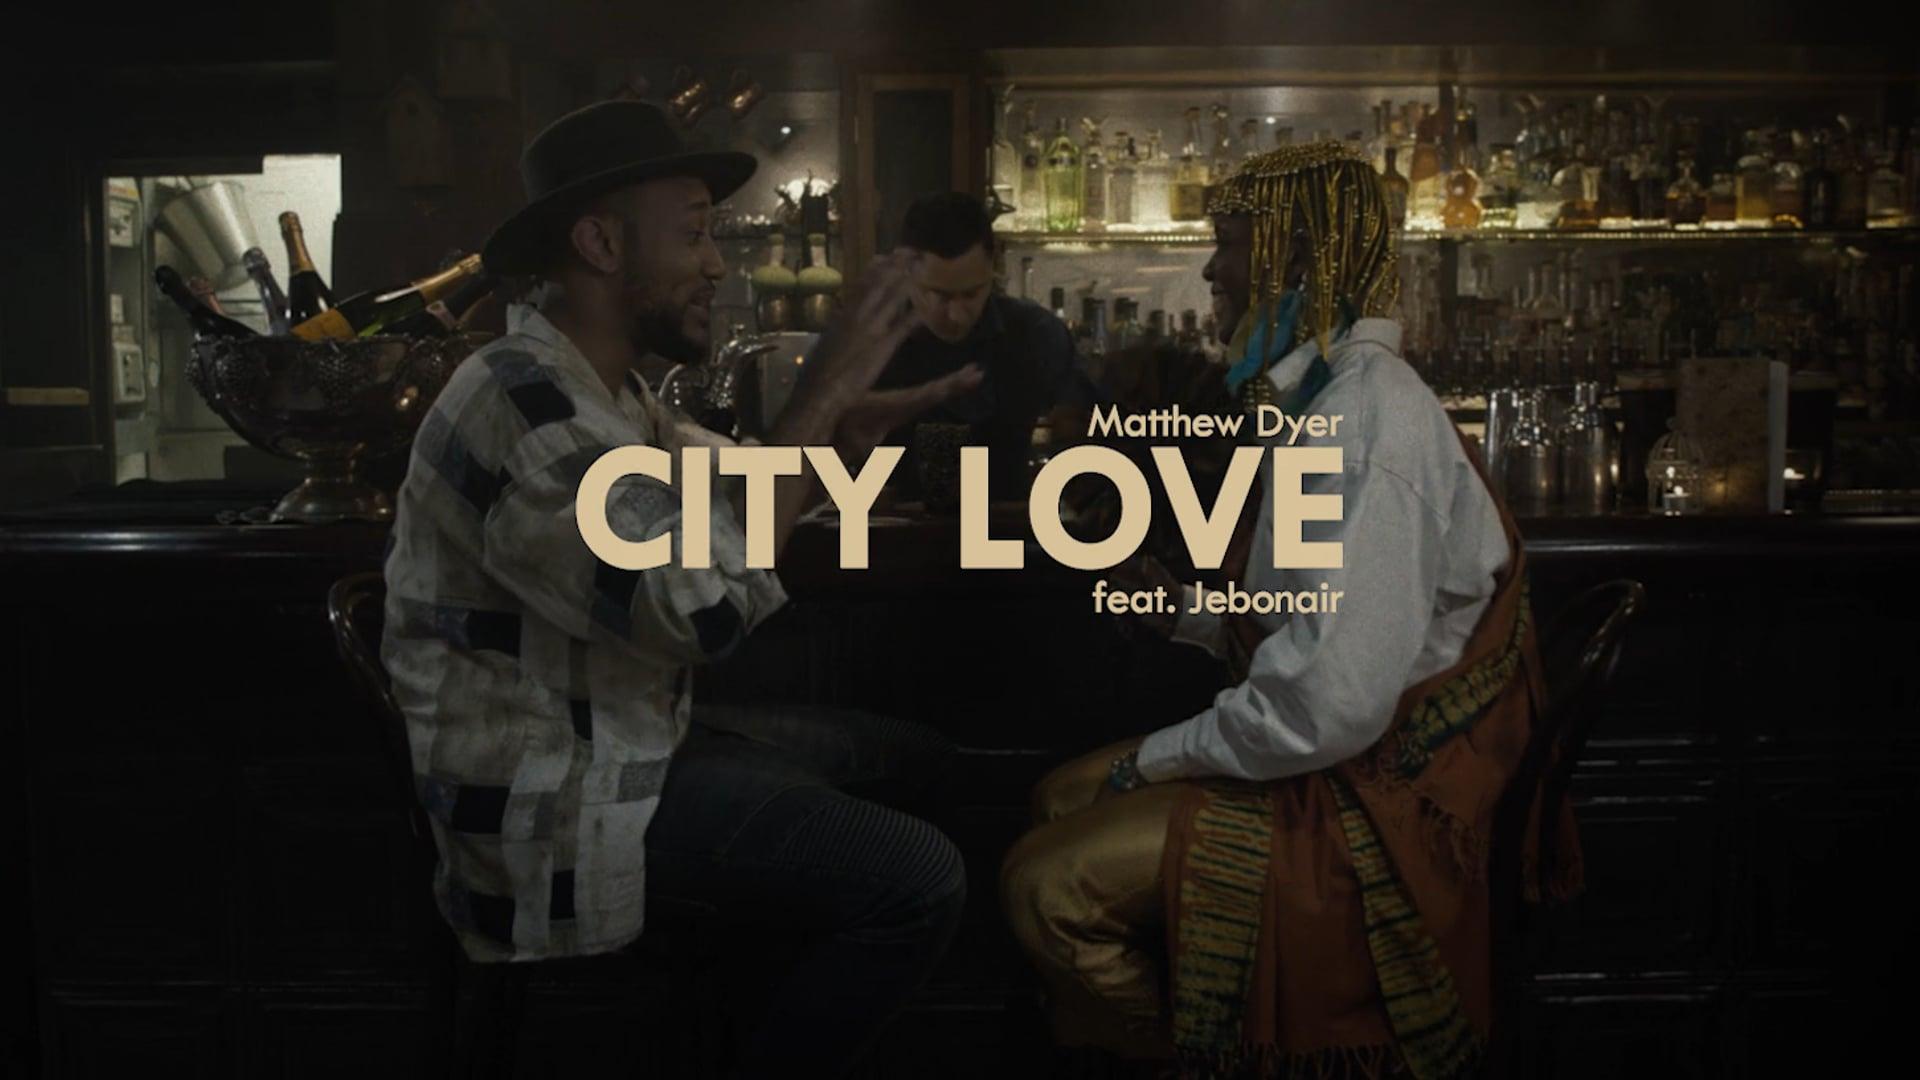 Matthew Dyer - City Love ft. Jebonair (Music Video)